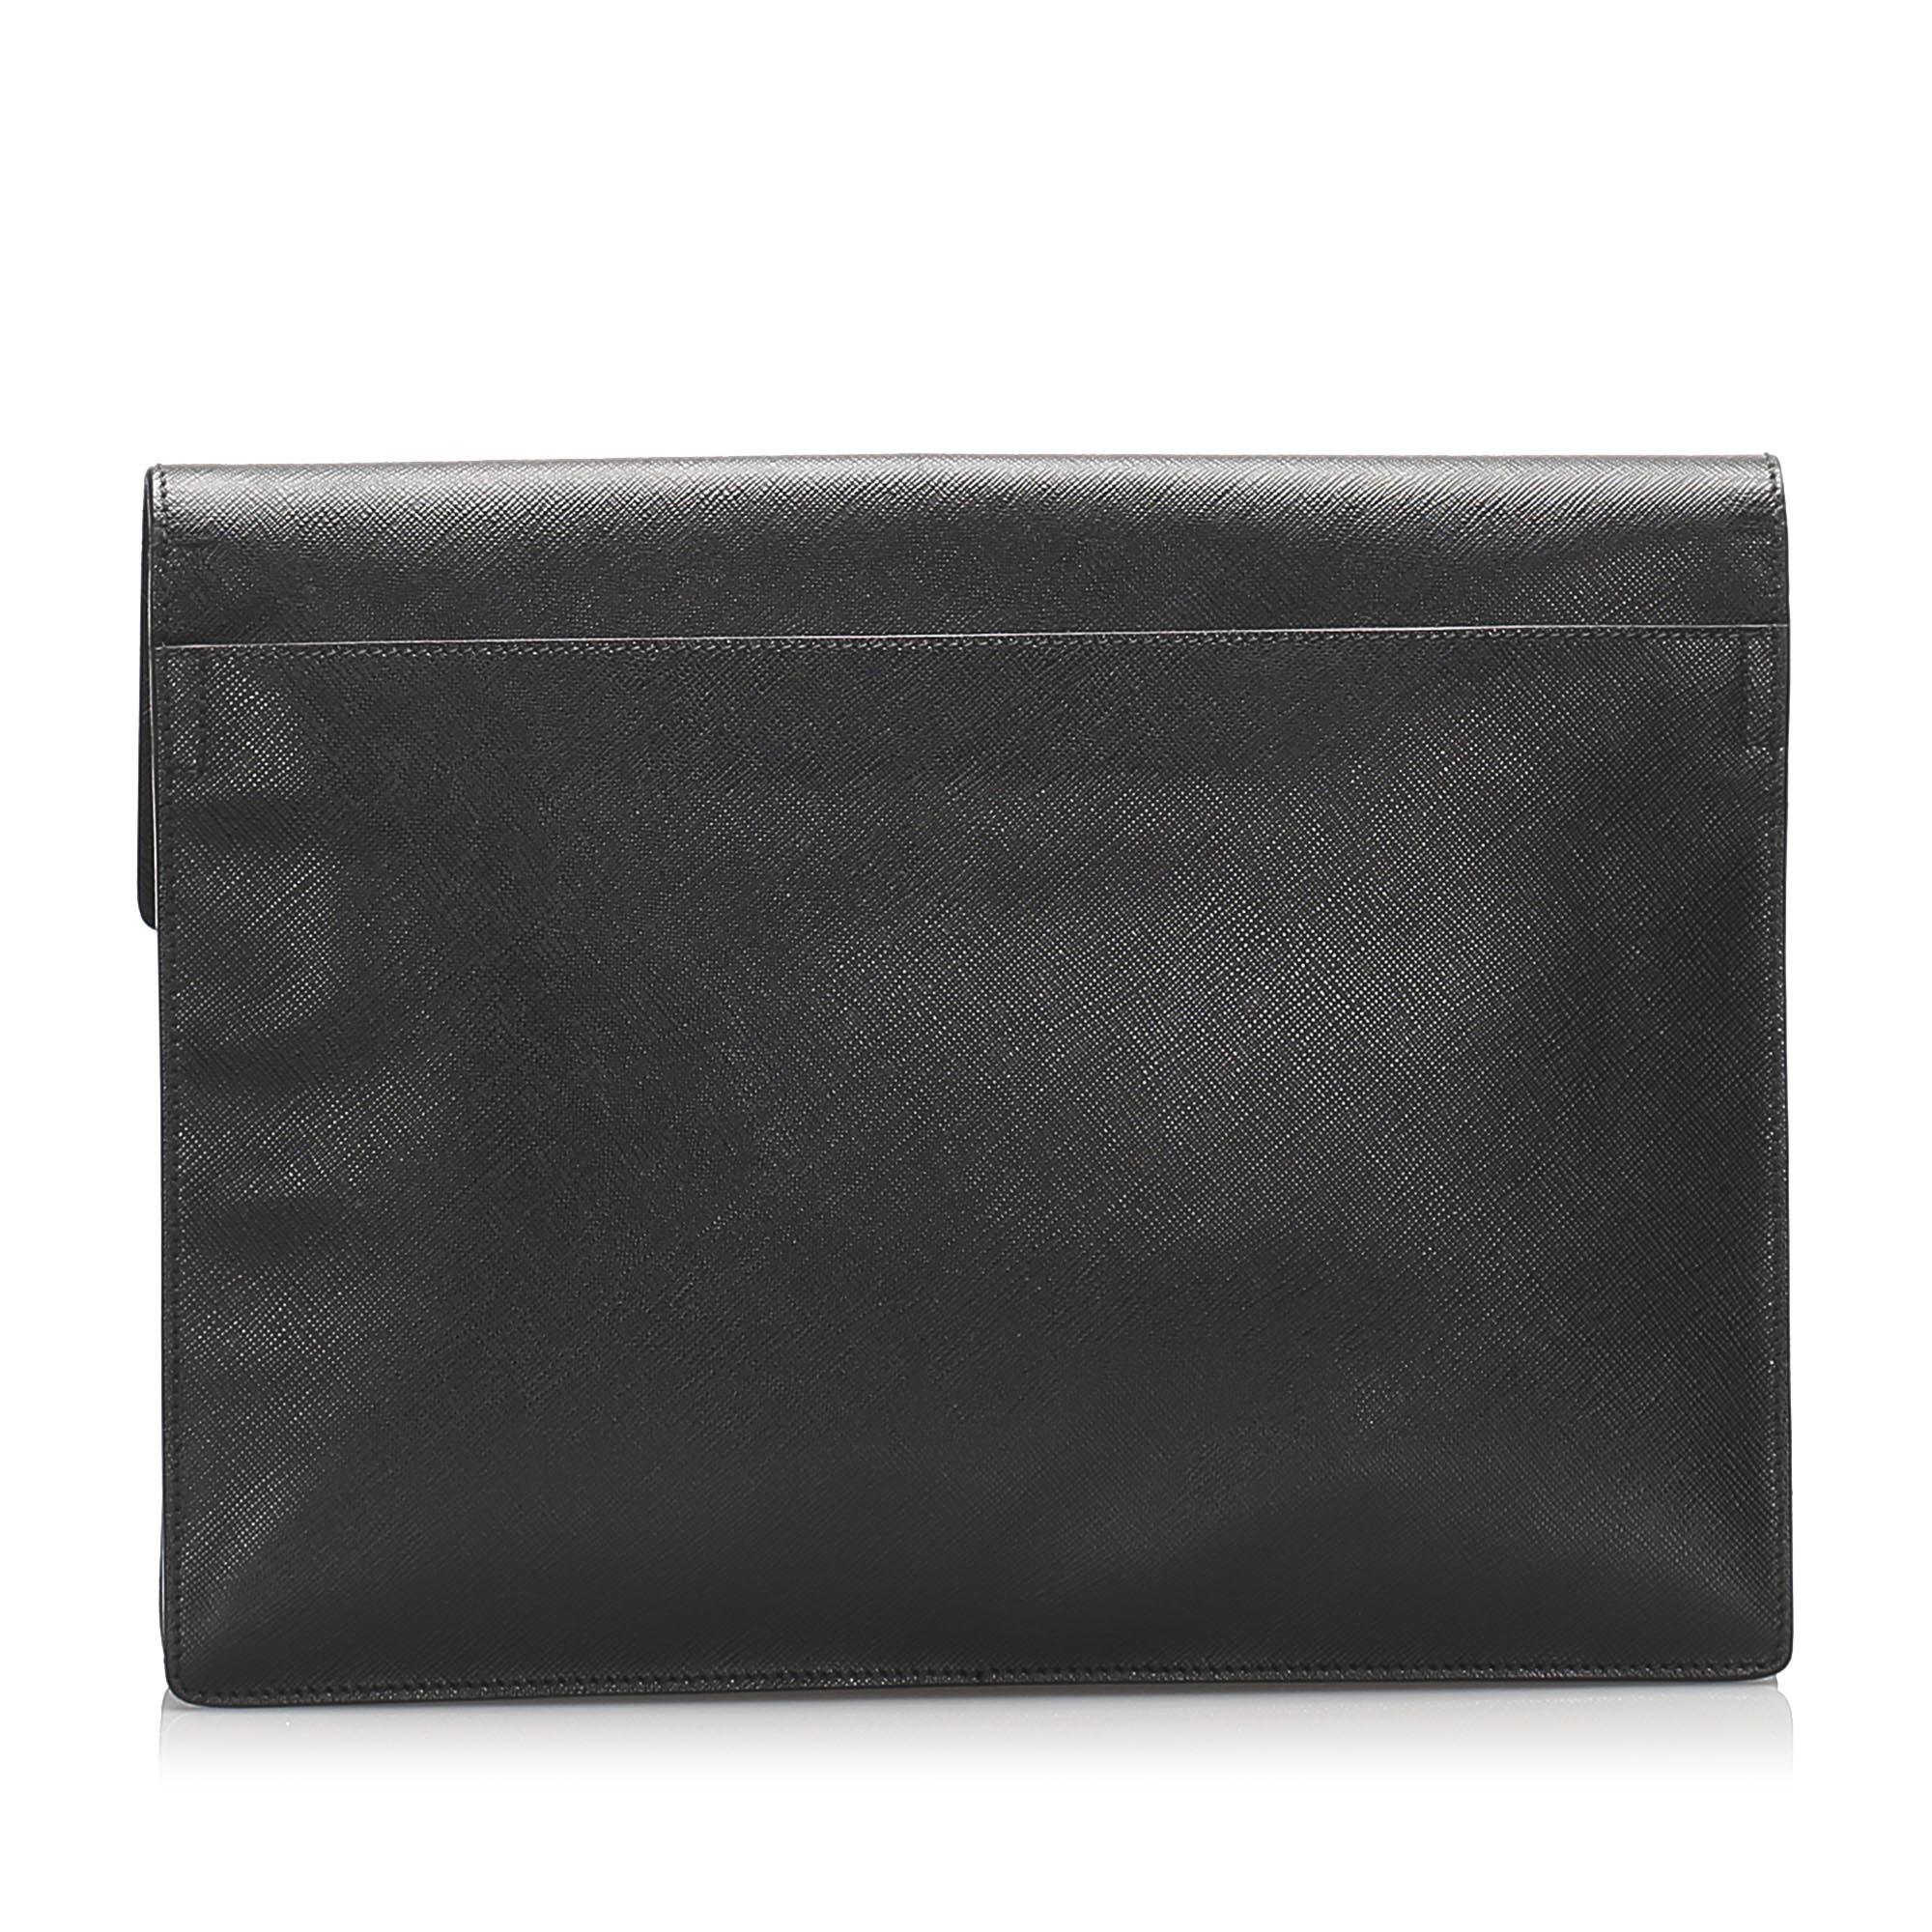 Vintage Prada Saffiano Clutch Bag Black